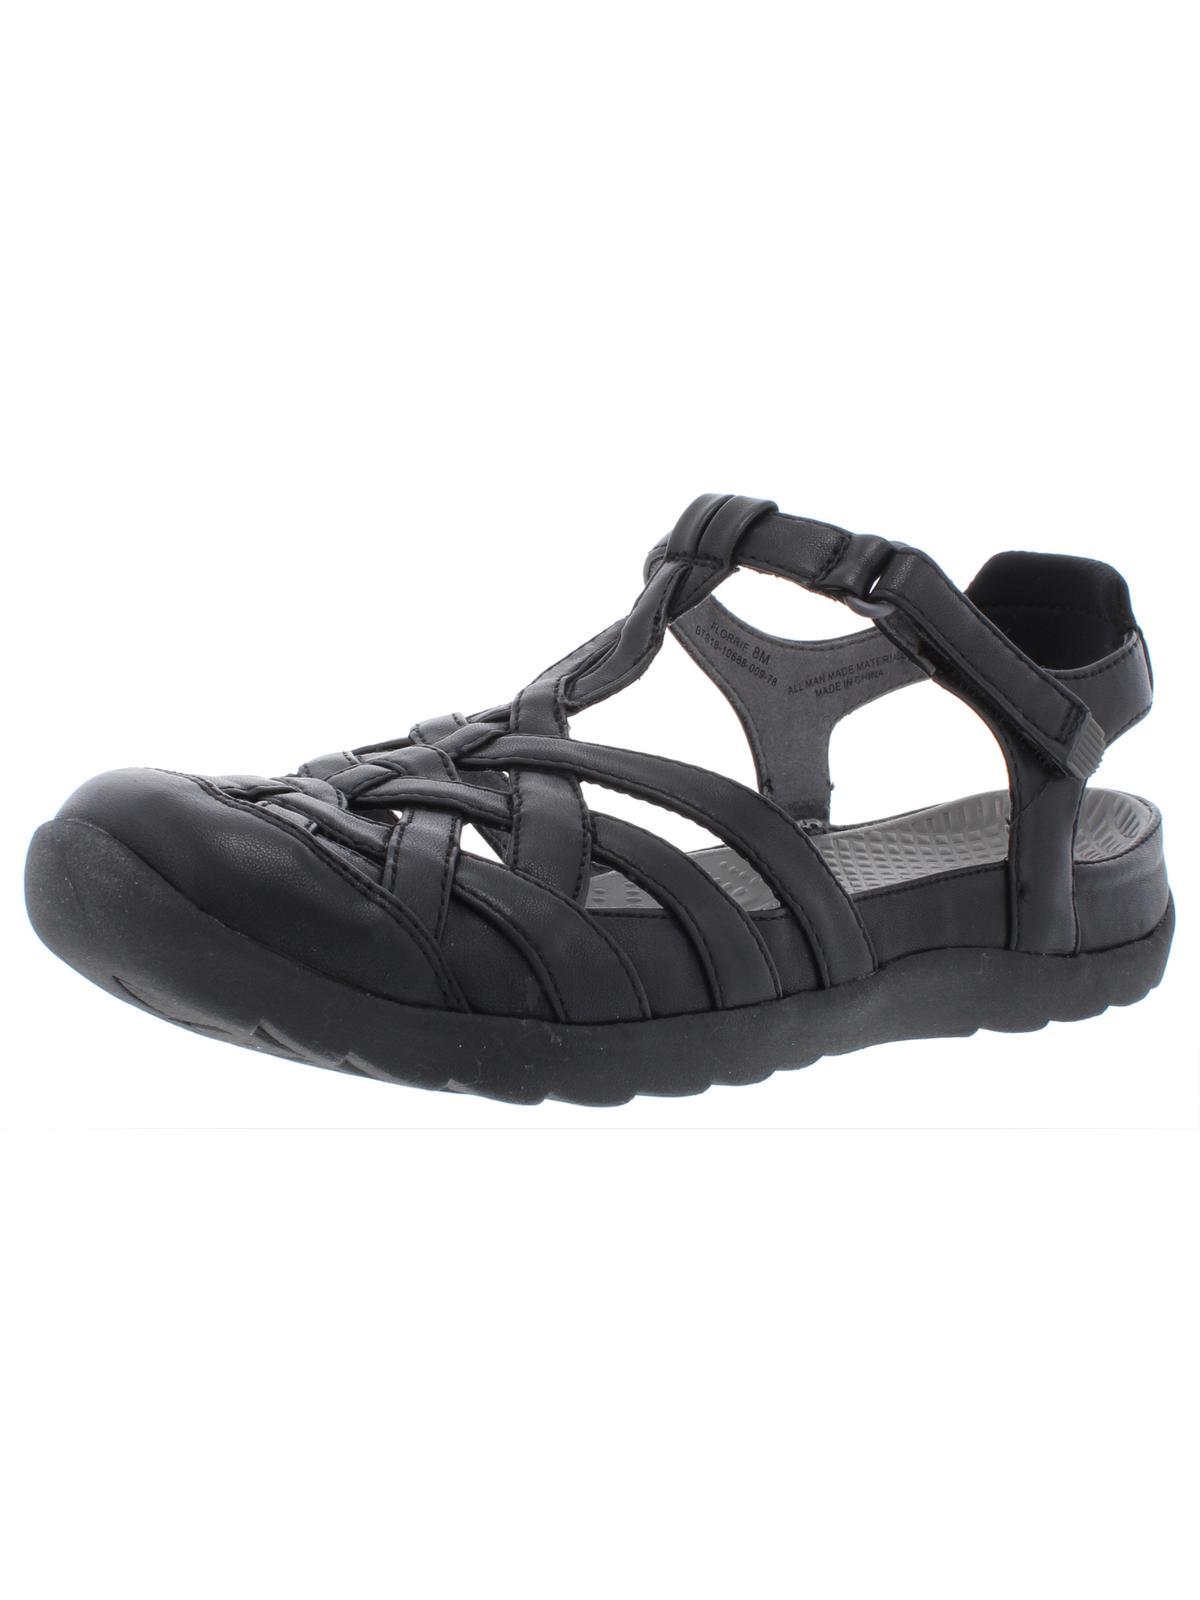 Womens BareTraps Florrie Comfort Sport Sandals, Brush Brown